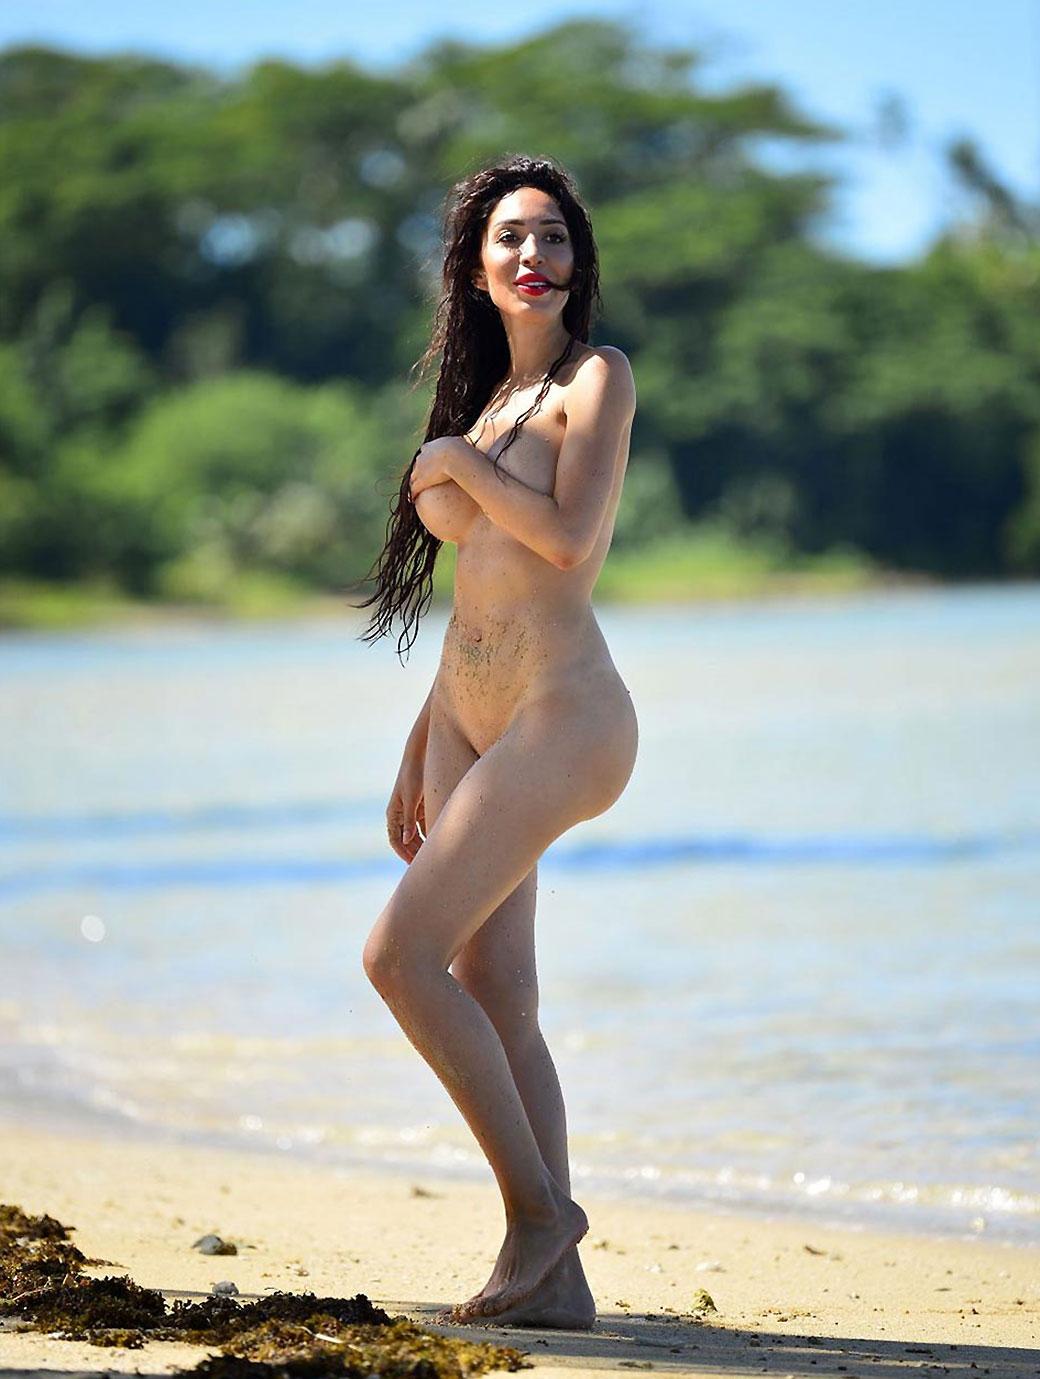 Abraham Porn Video farrah abraham nude pics and porn compilation - scandalpost